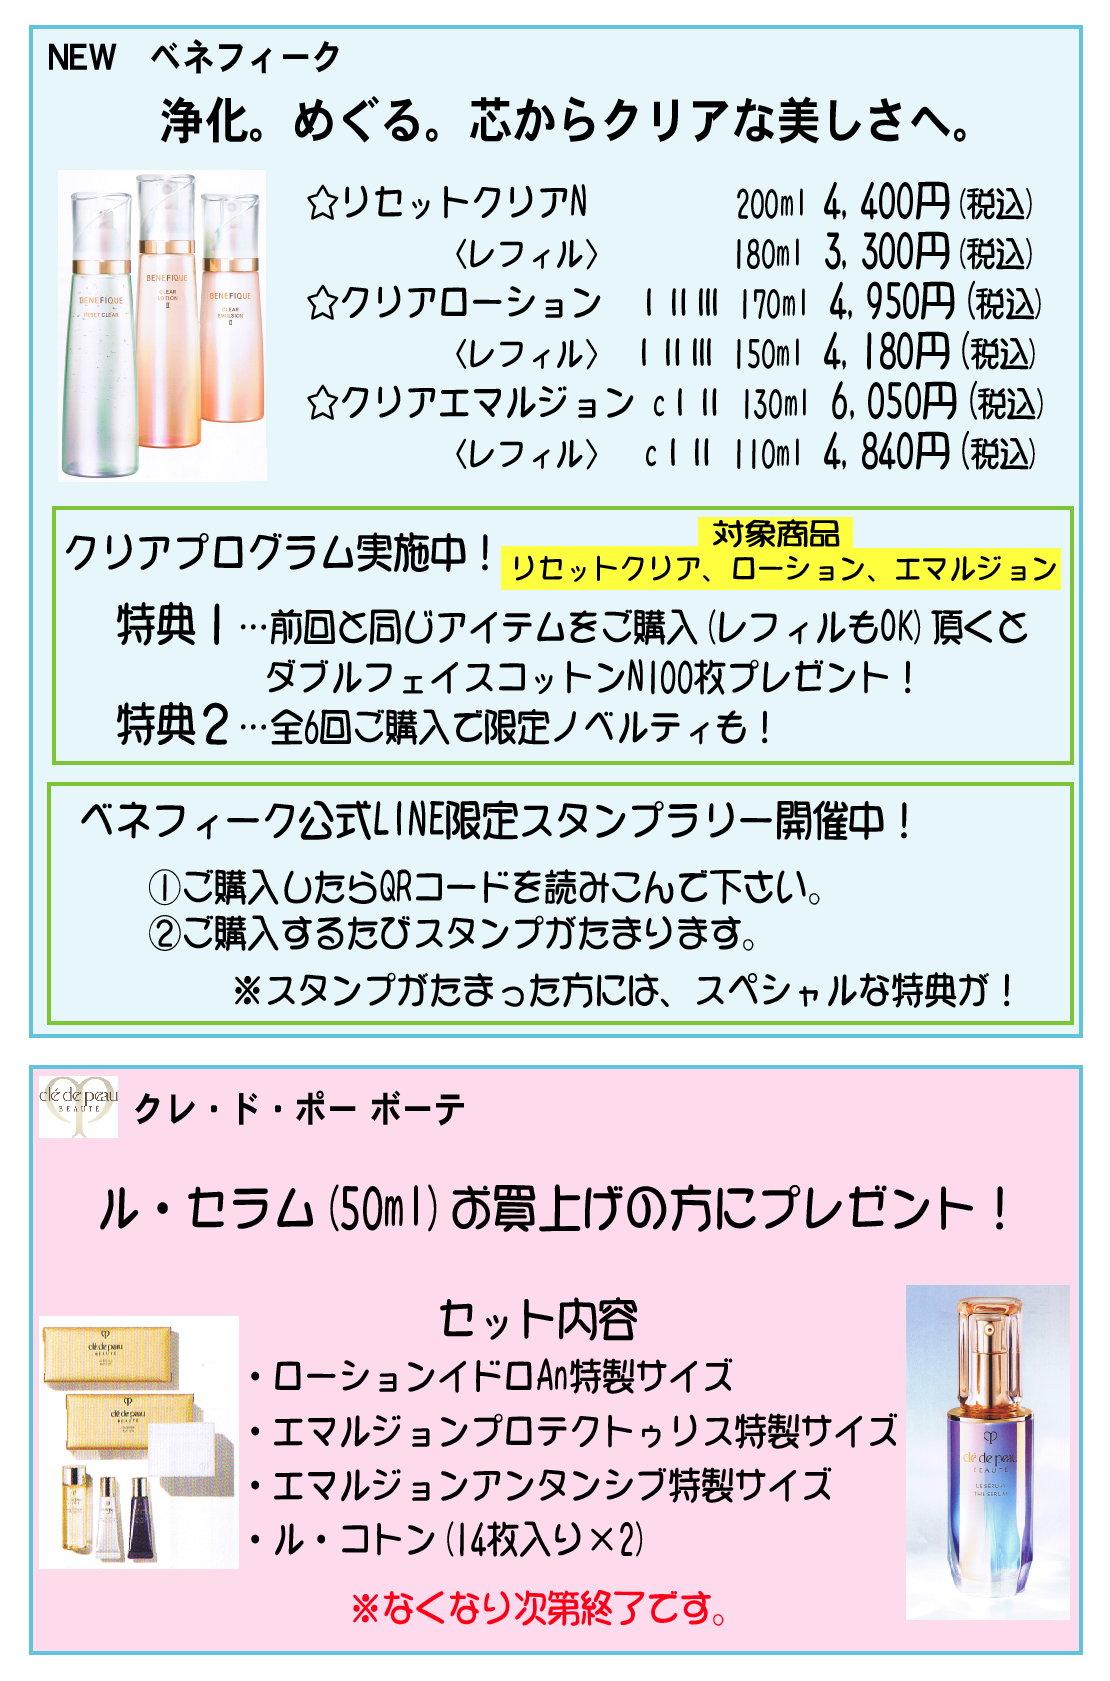 shiseido_20210419_2